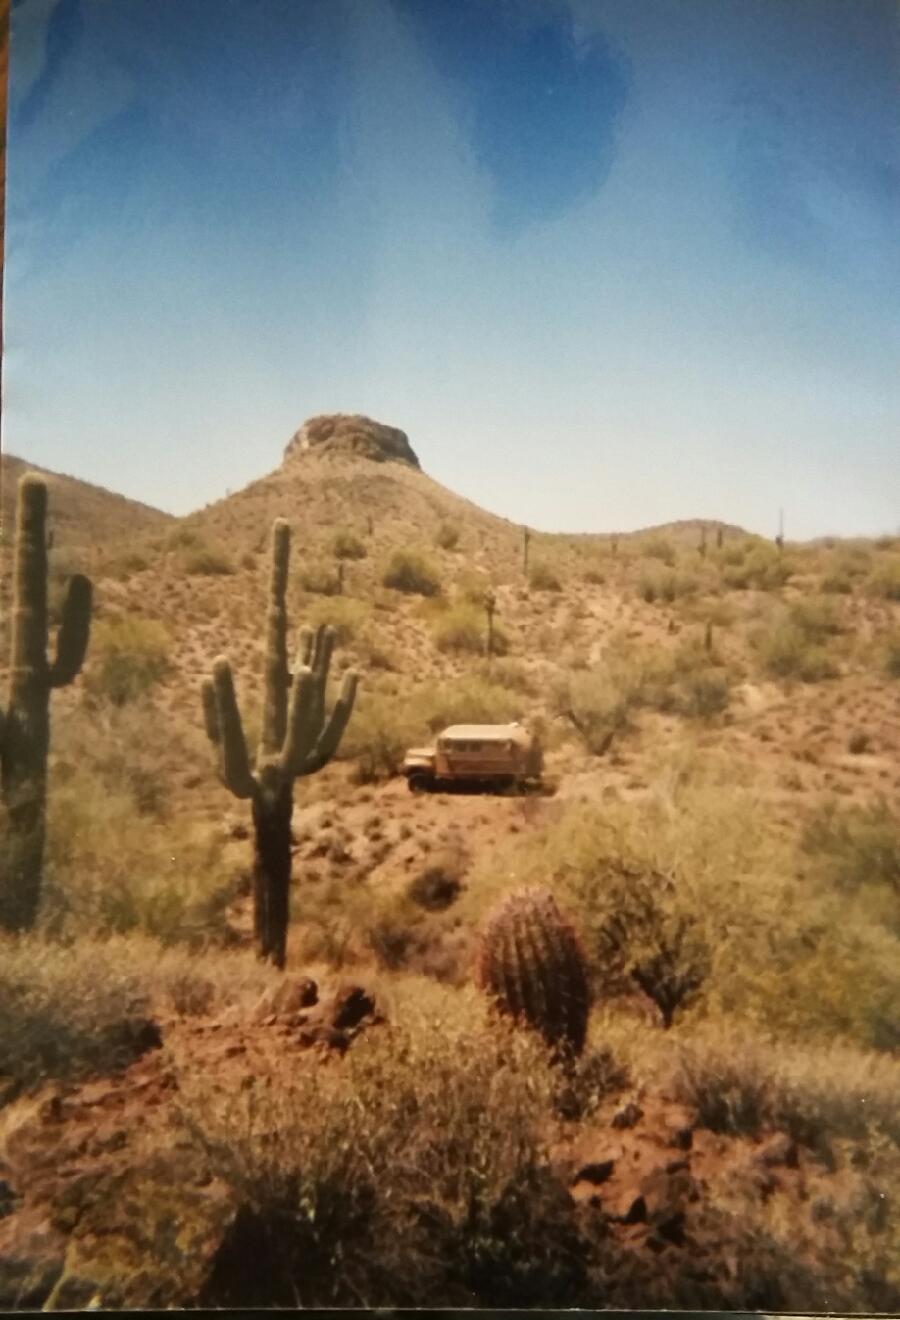 J.D'S CHARLEY BUS IN PHOENIX, AZ., HE THINKS.